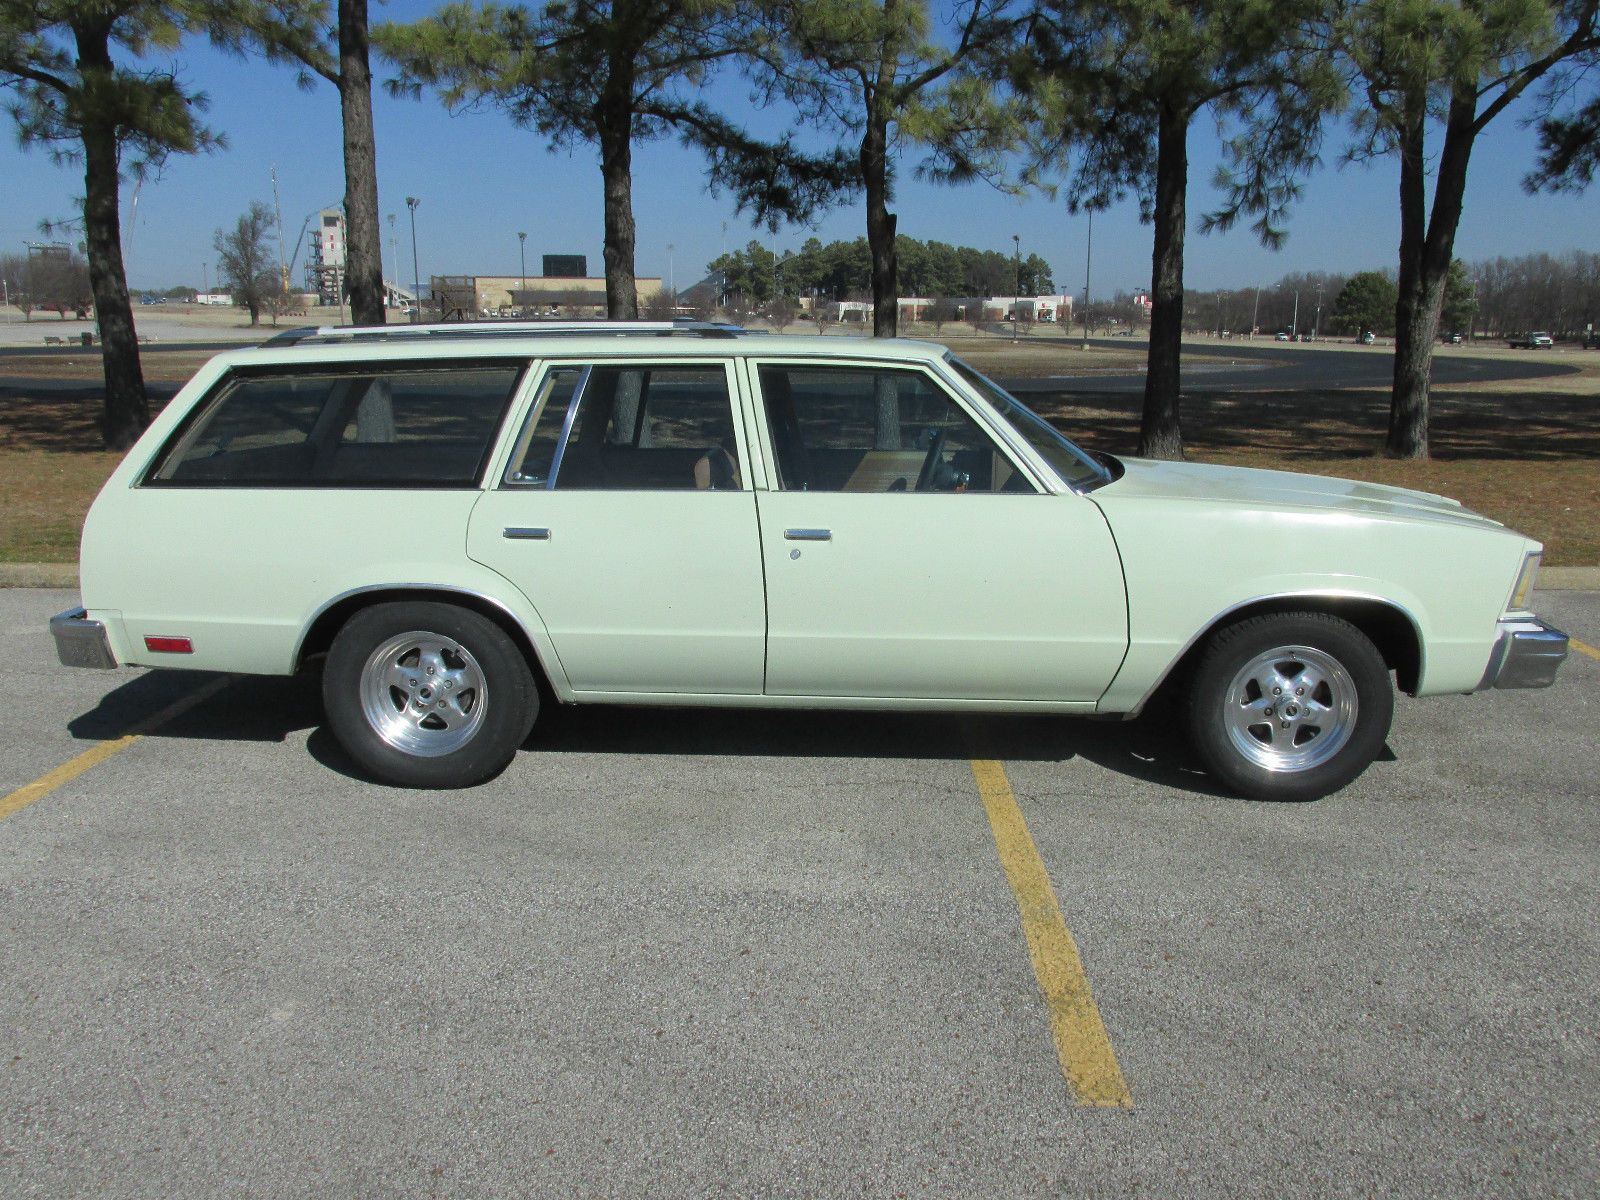 Chevrolet malibu classic estate wagon 4 door 1979 chevrolet malibu classic estate station wagon g